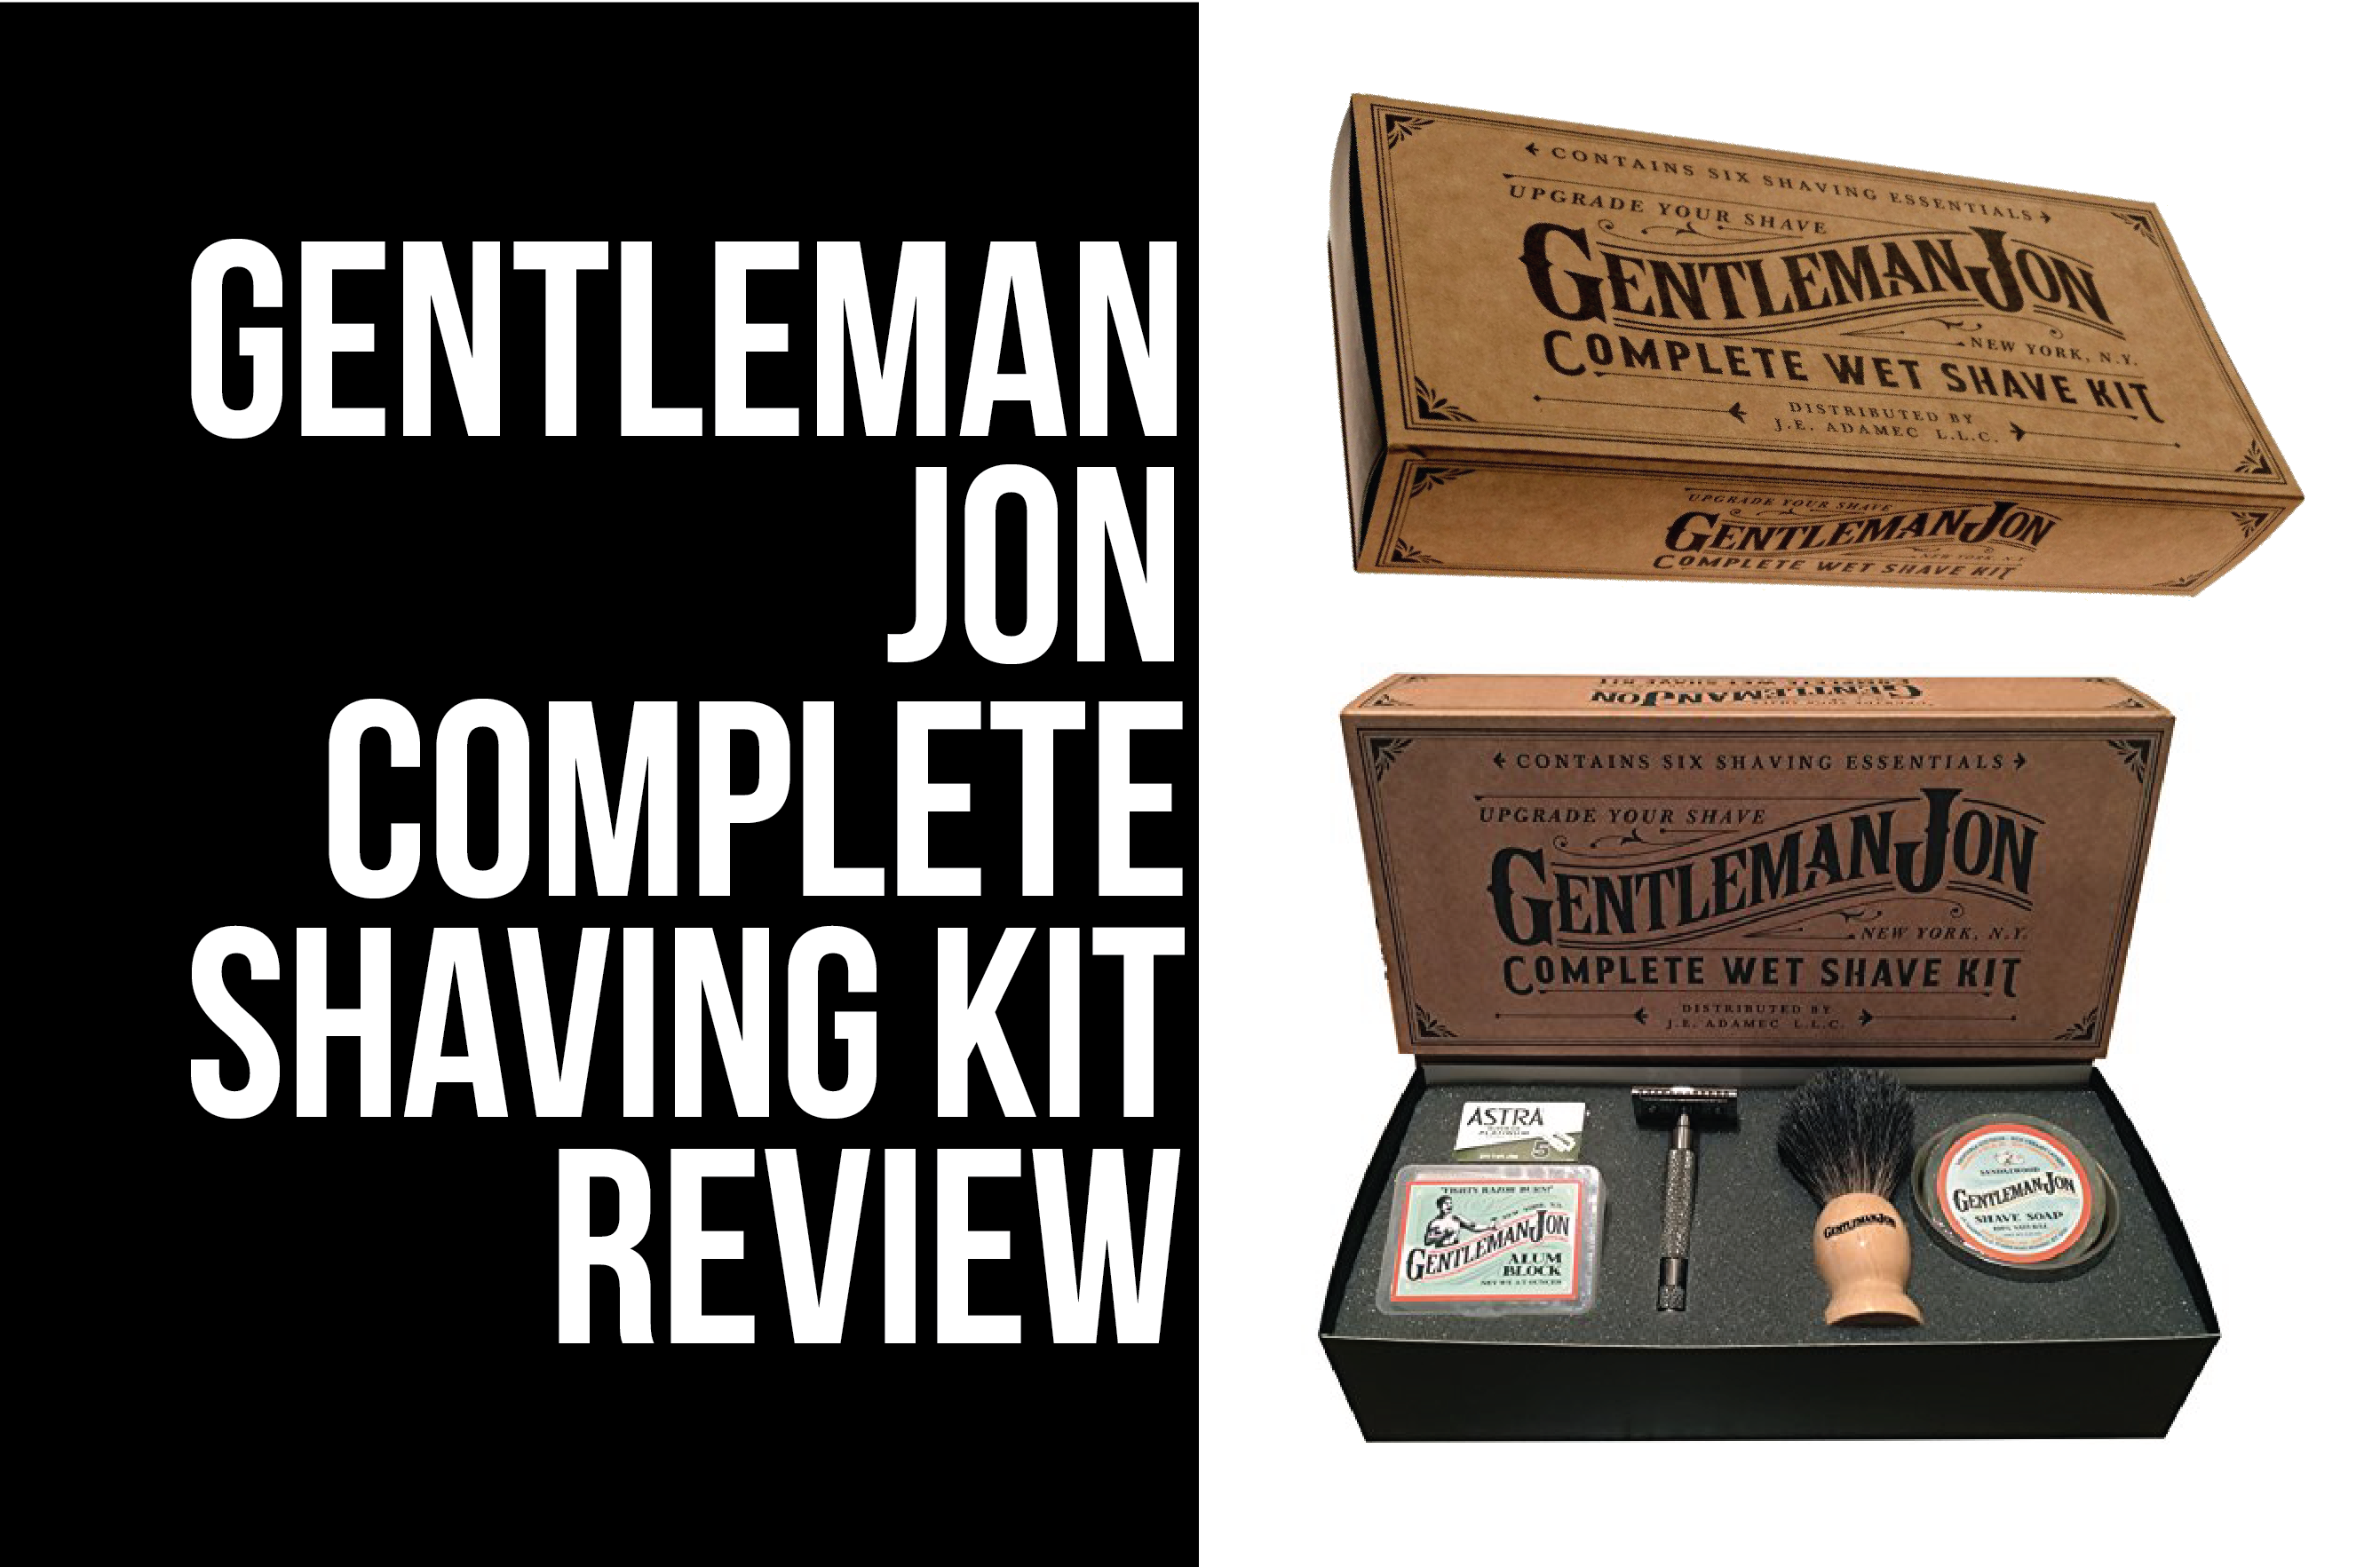 gentleman jon shaving kit